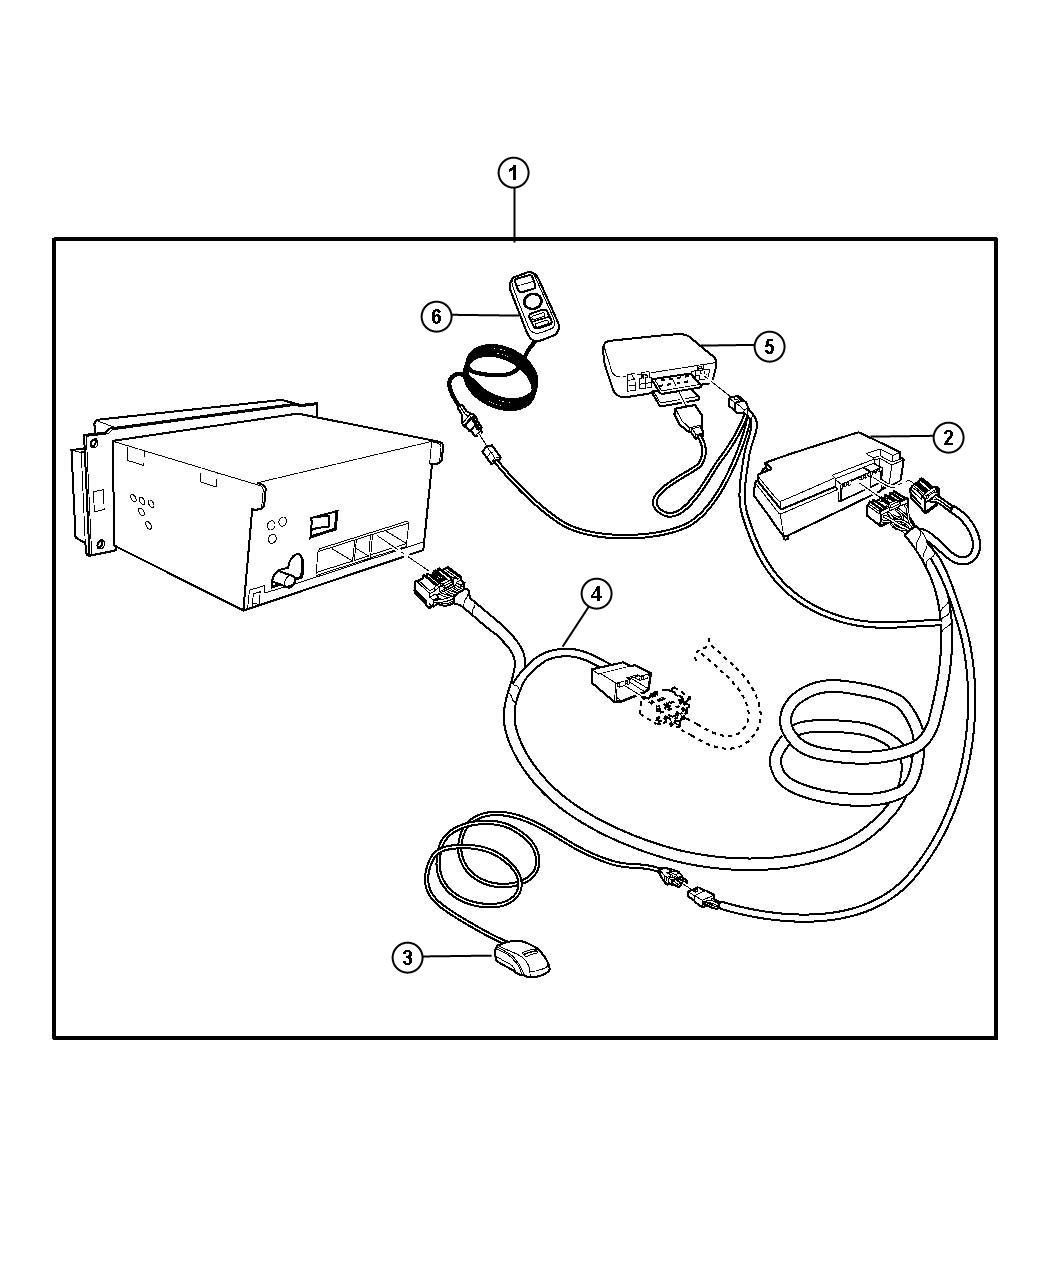 Dodge Intrepid Hands Free Kit Cellular Phone Bluetooth